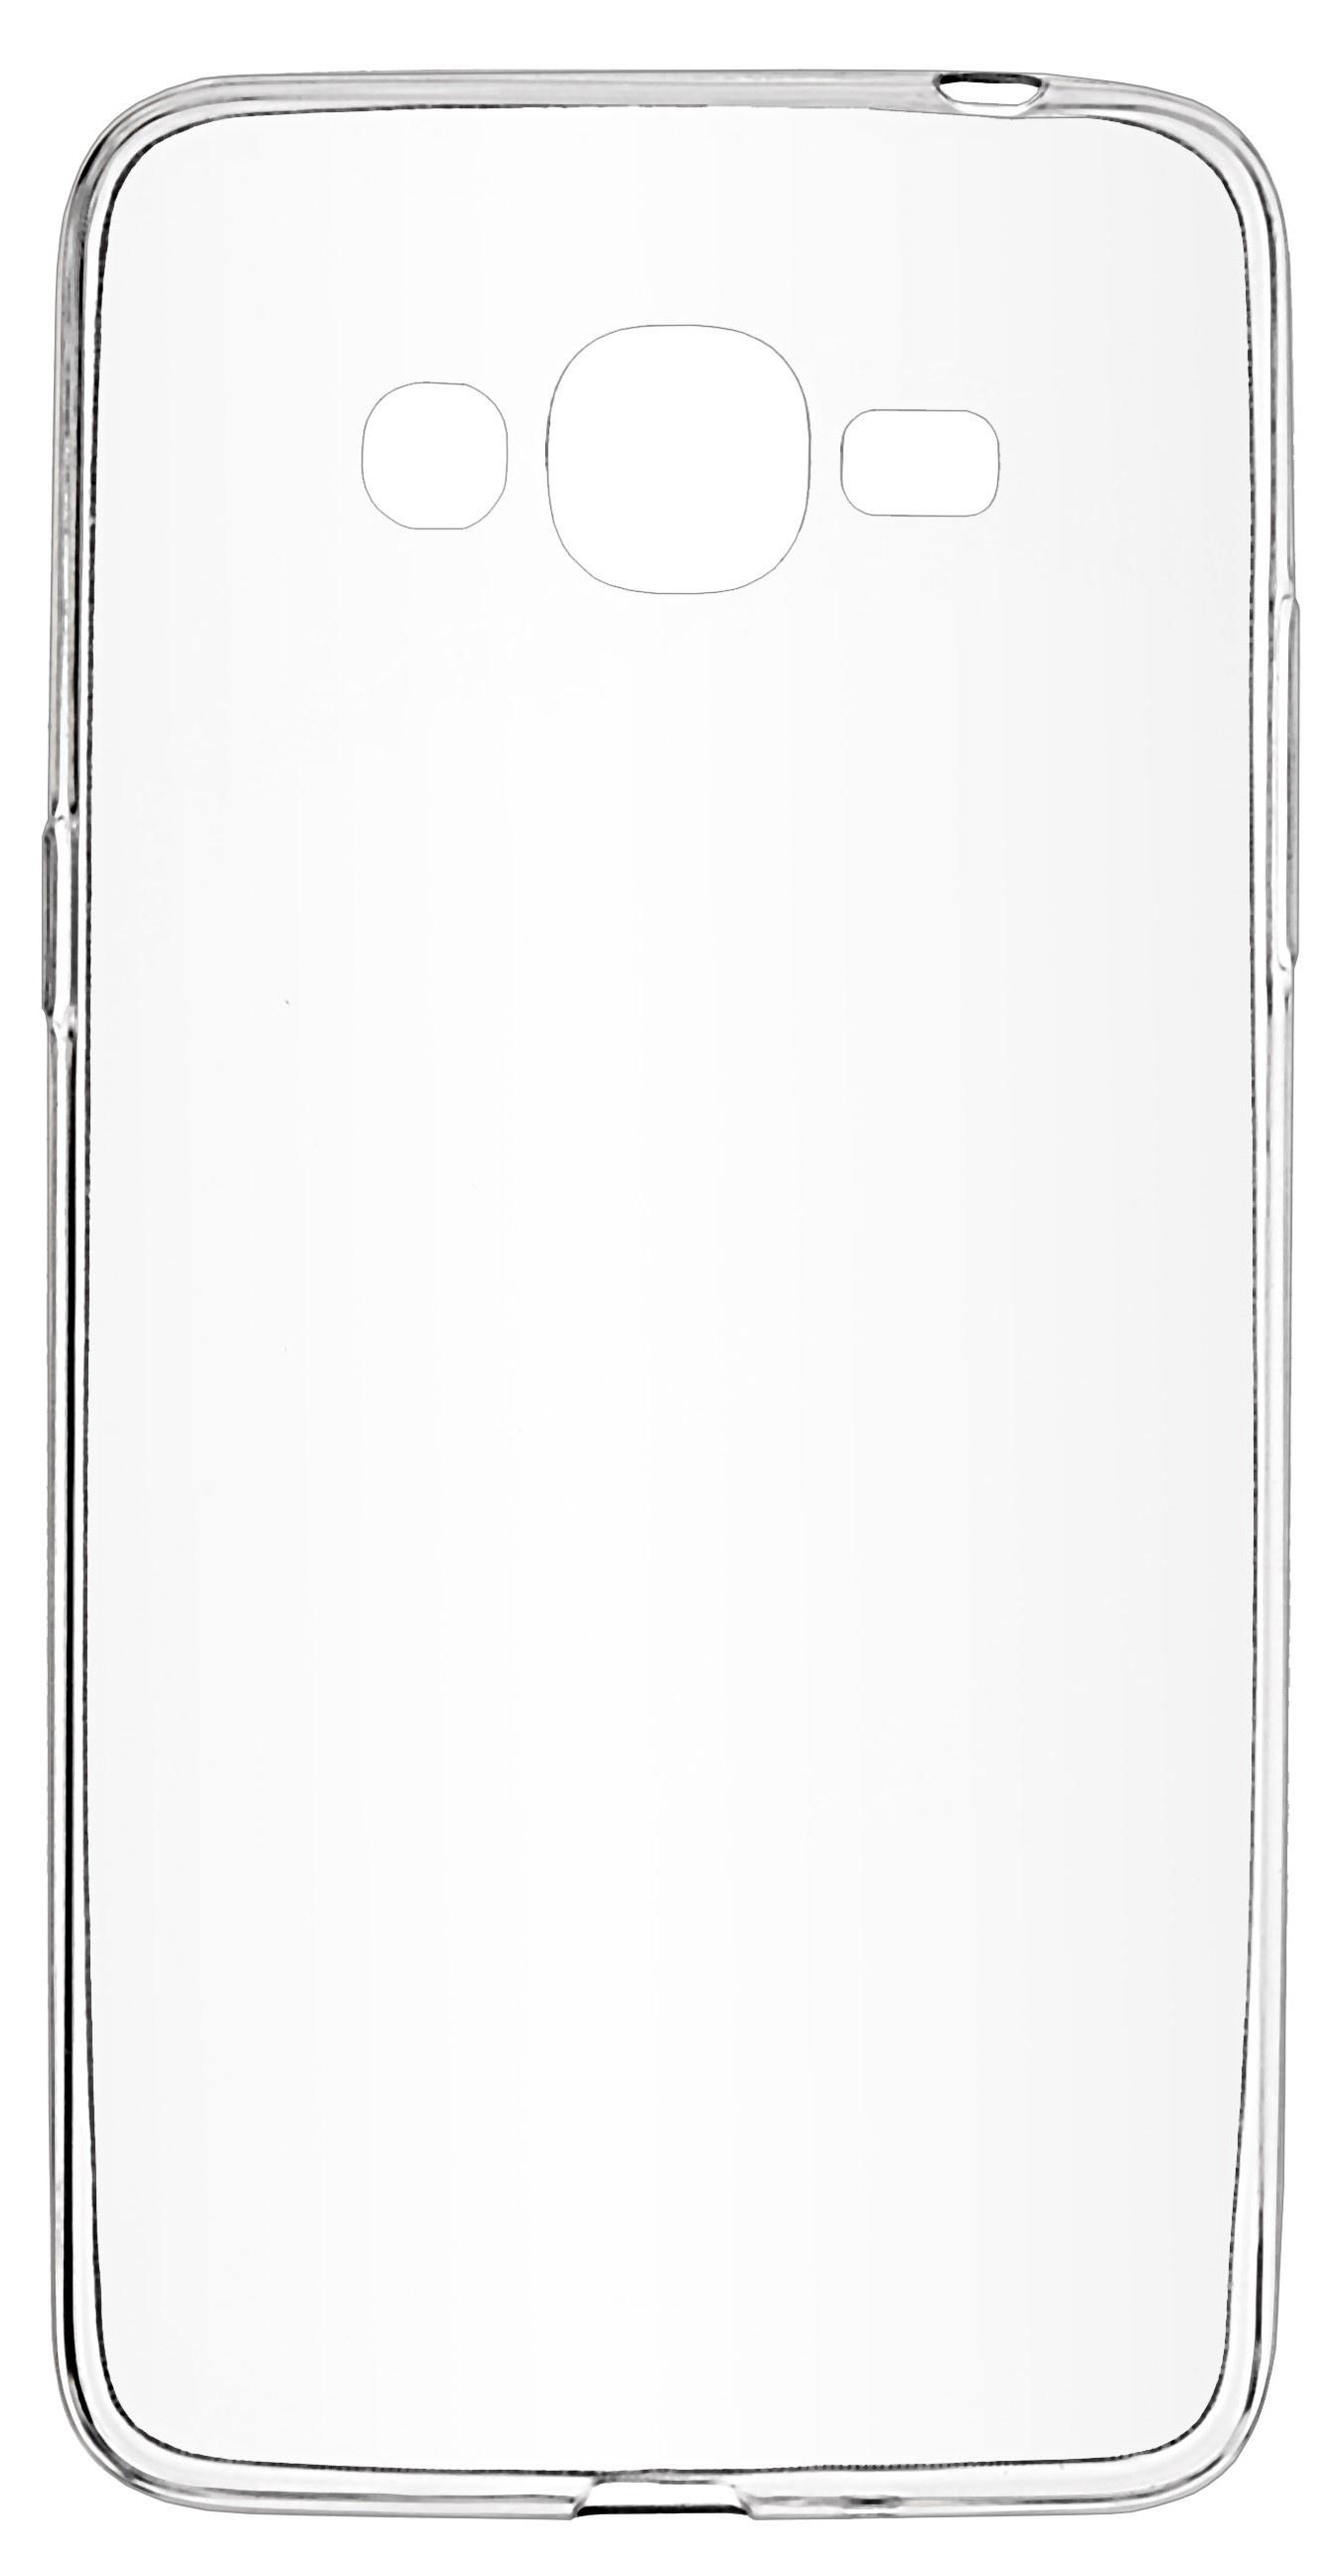 Чехол для сотового телефона skinBOX Slim Silicone, 4630042524576, прозрачный skinbox накладка skinbox slim silicone для samsung galaxy note 7